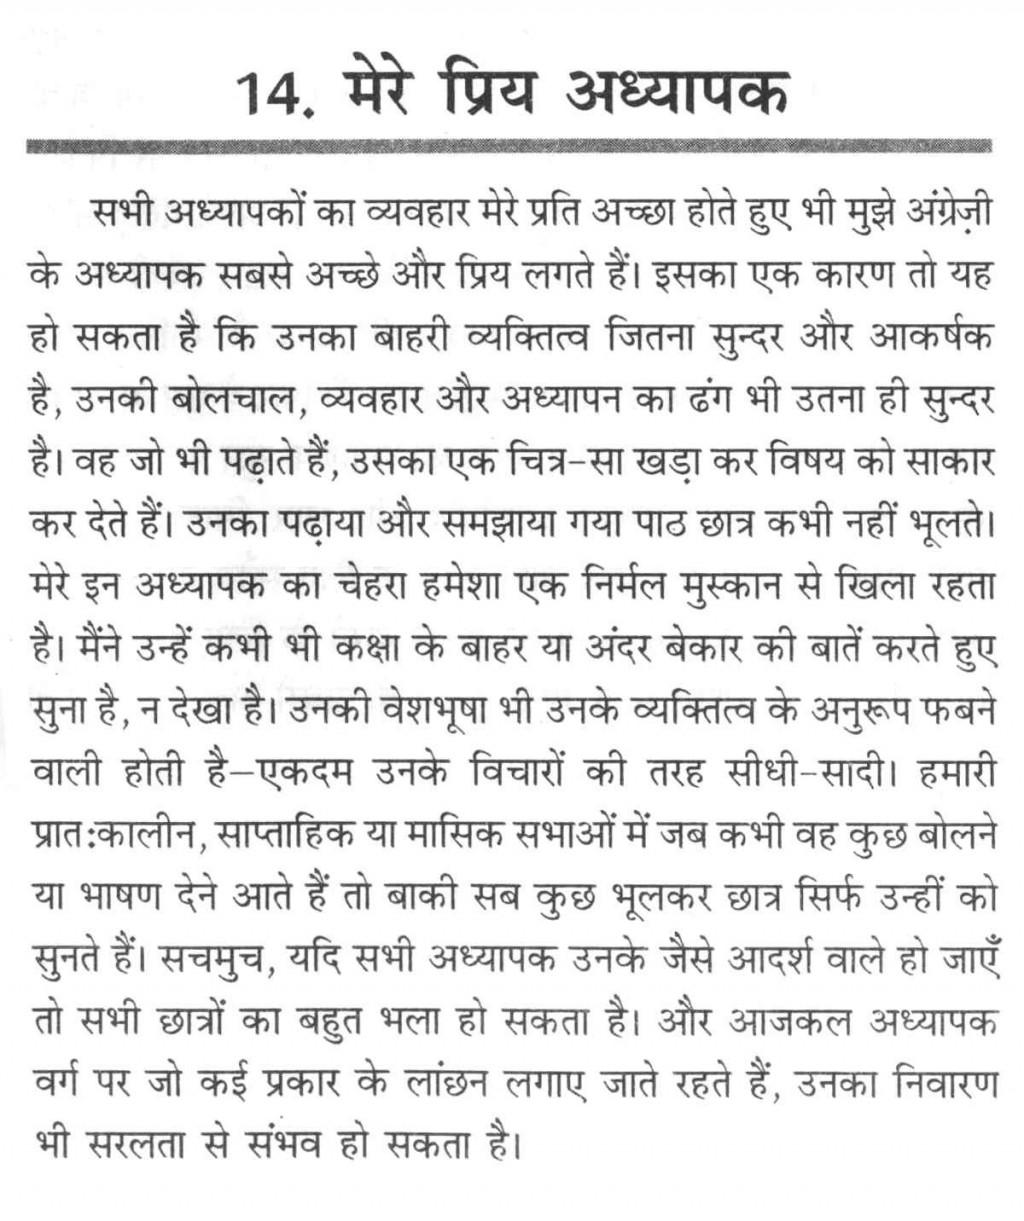 020 Essay On Teacher Example Marvelous Teachers In Kannada Profession Urdu Day Hindi For Class 2 Large